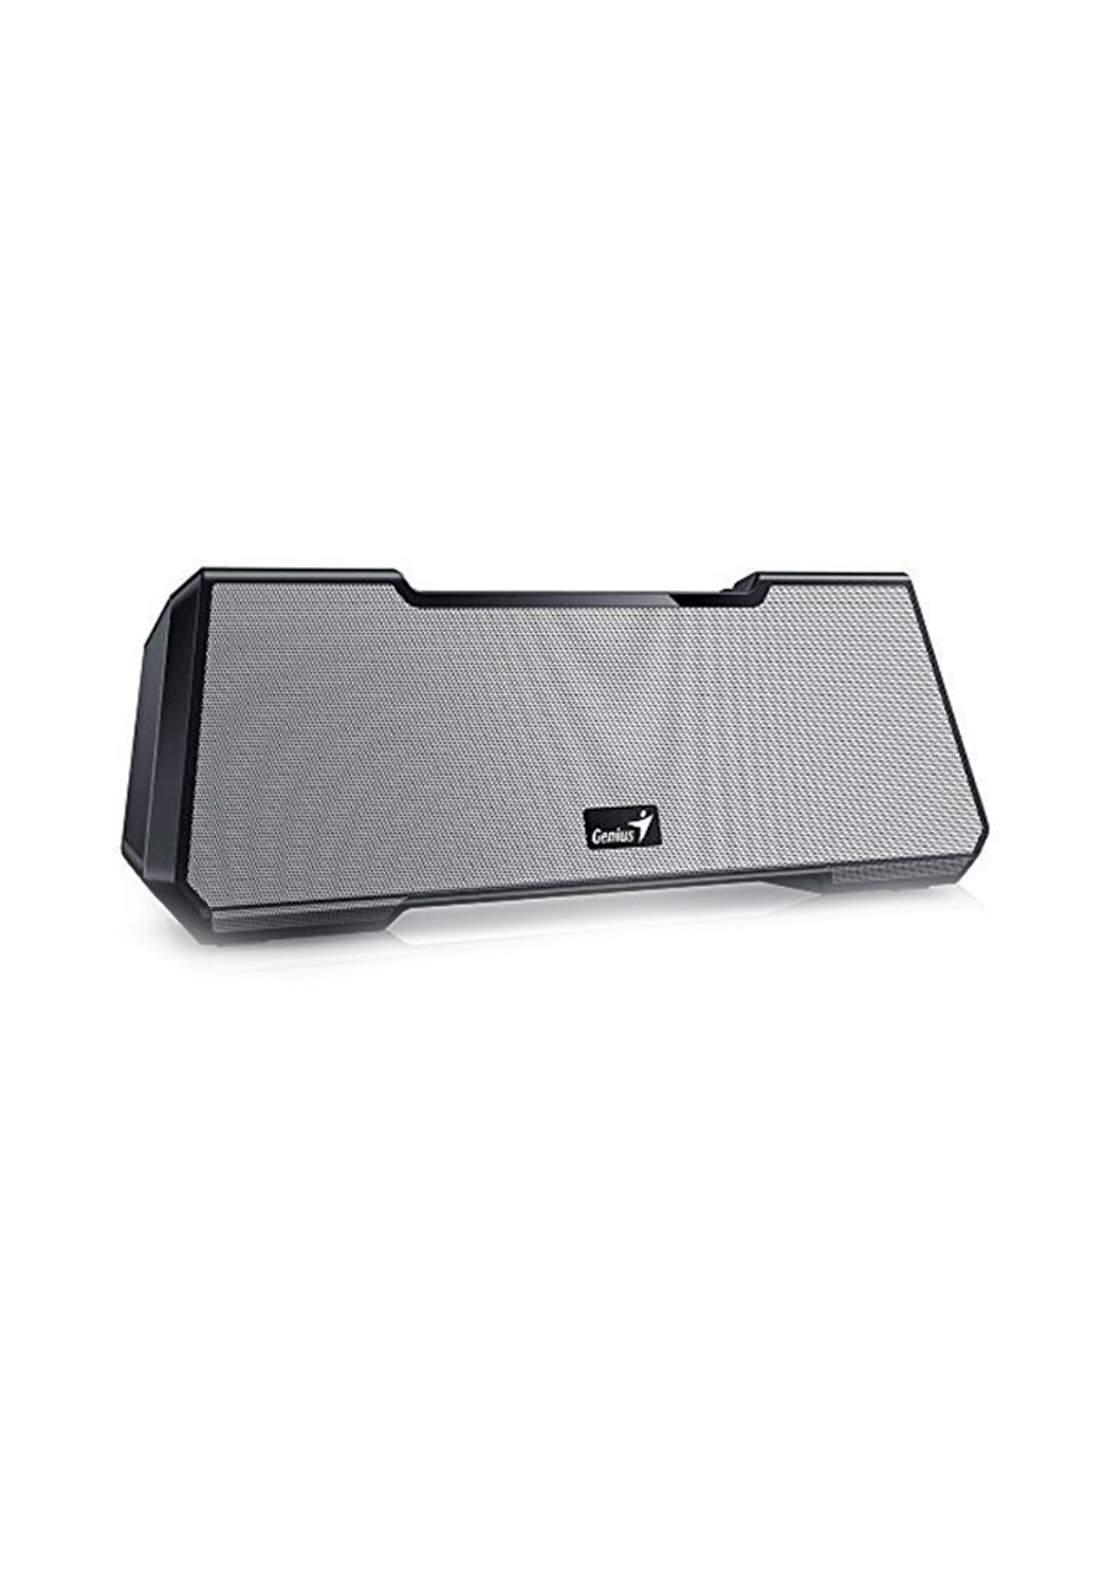 Genius MT-20 Bluetooth Speaker - Silver سبيكر